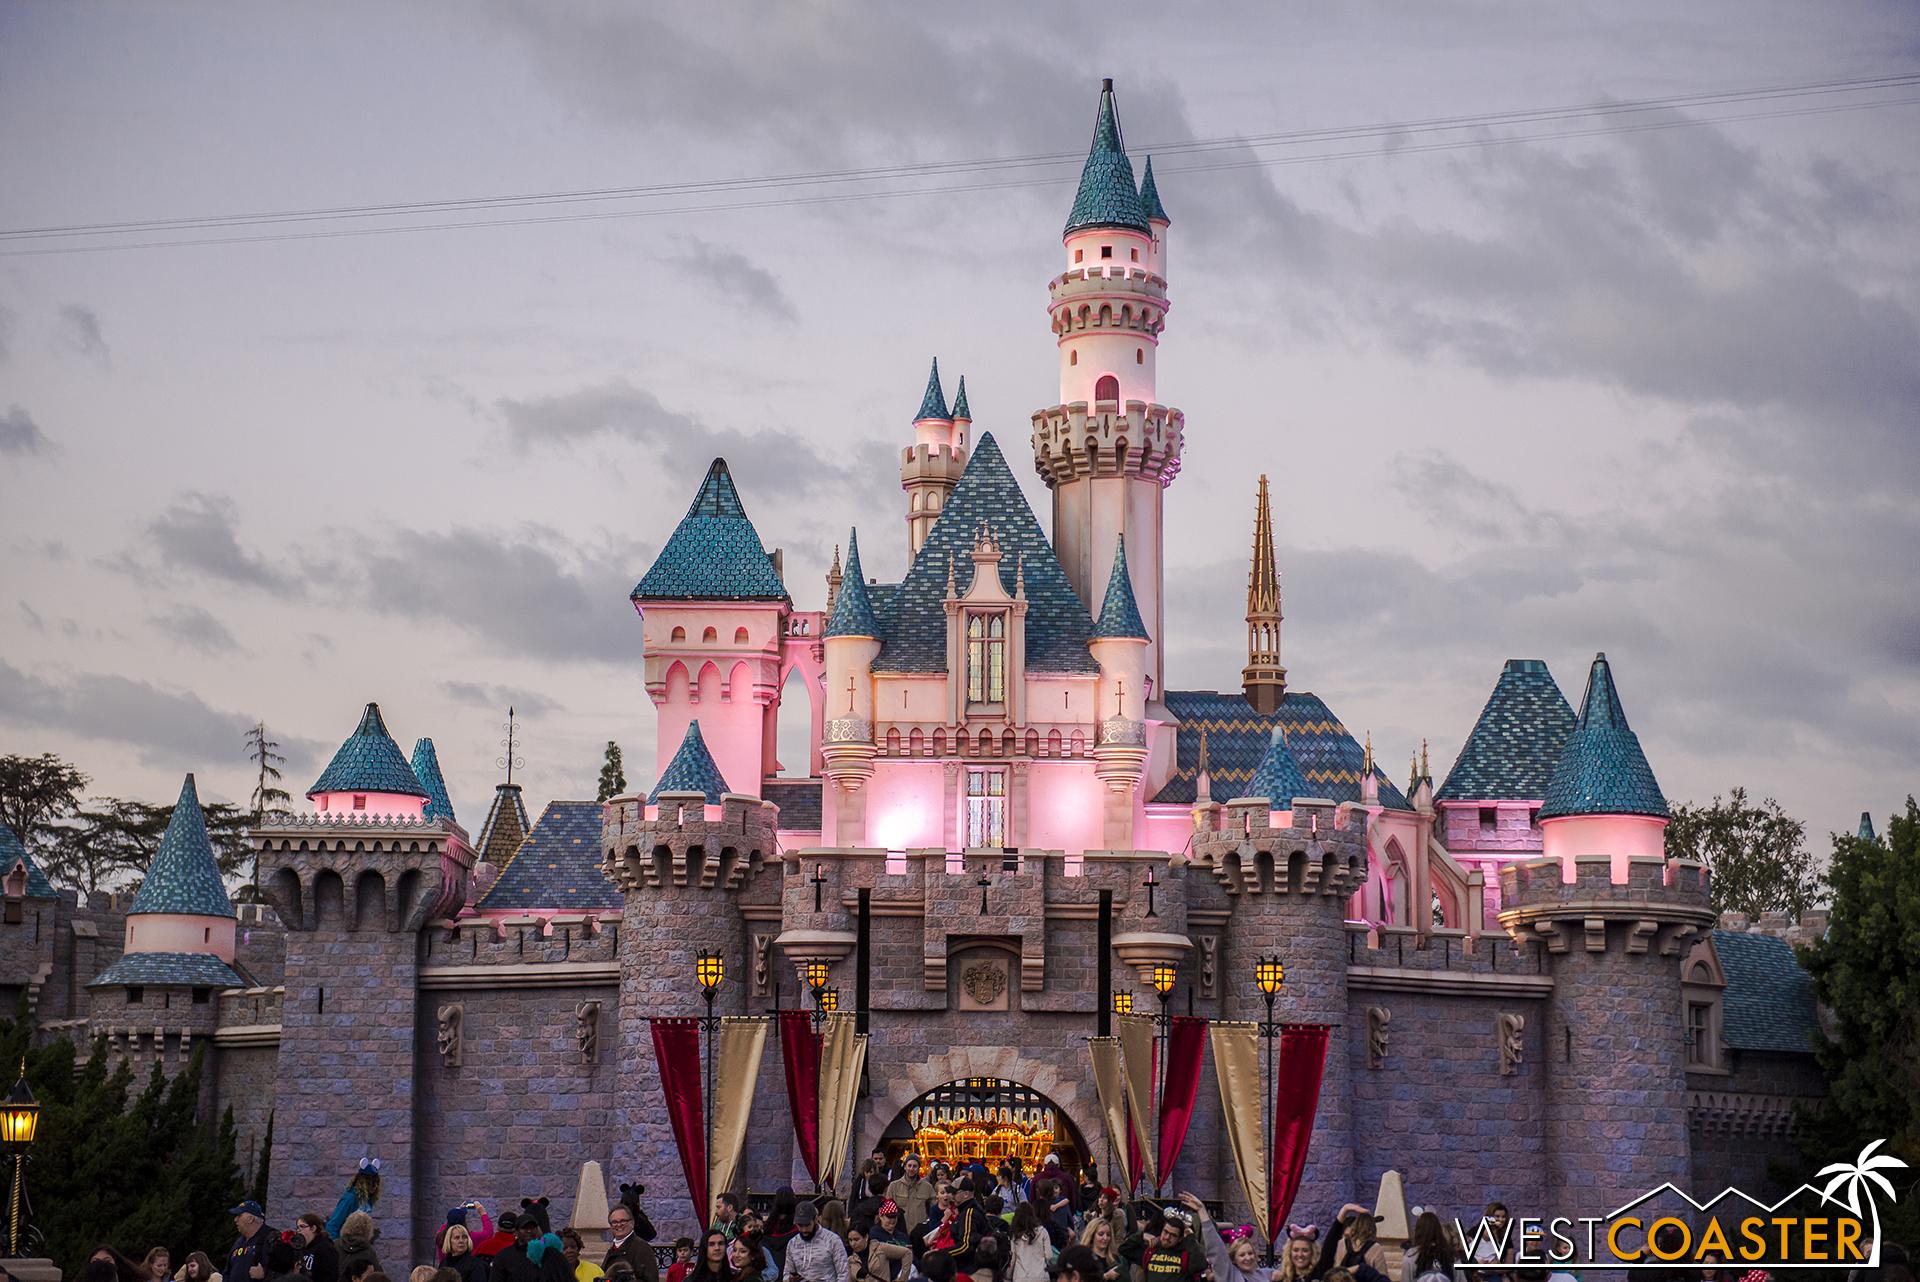 No Christmas tree! No Christmas! Plus the castle is splooge-free!